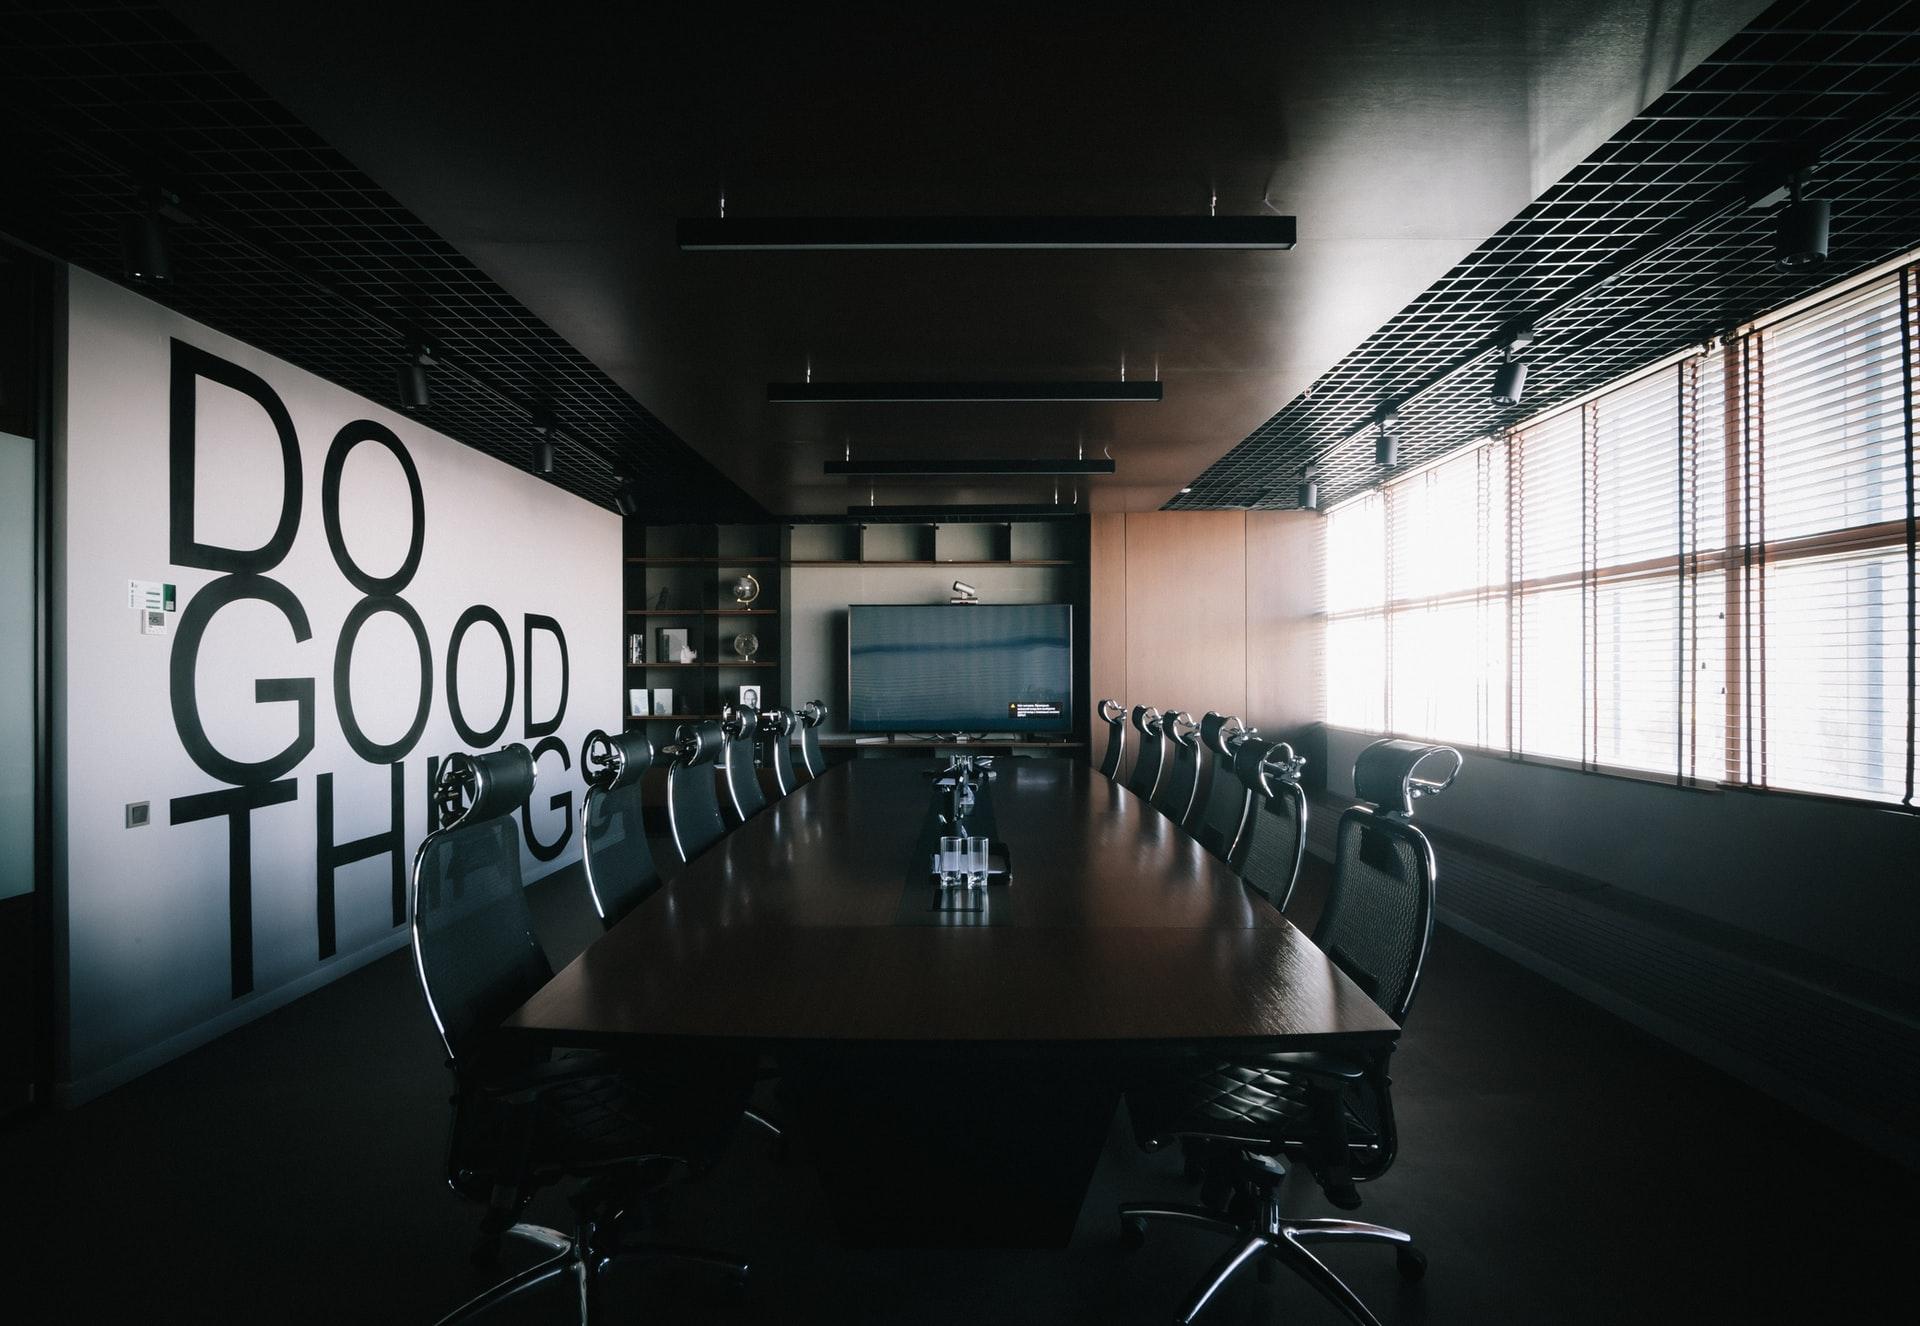 Big board | Do Good things | L'Agence de PUB - The AD agency